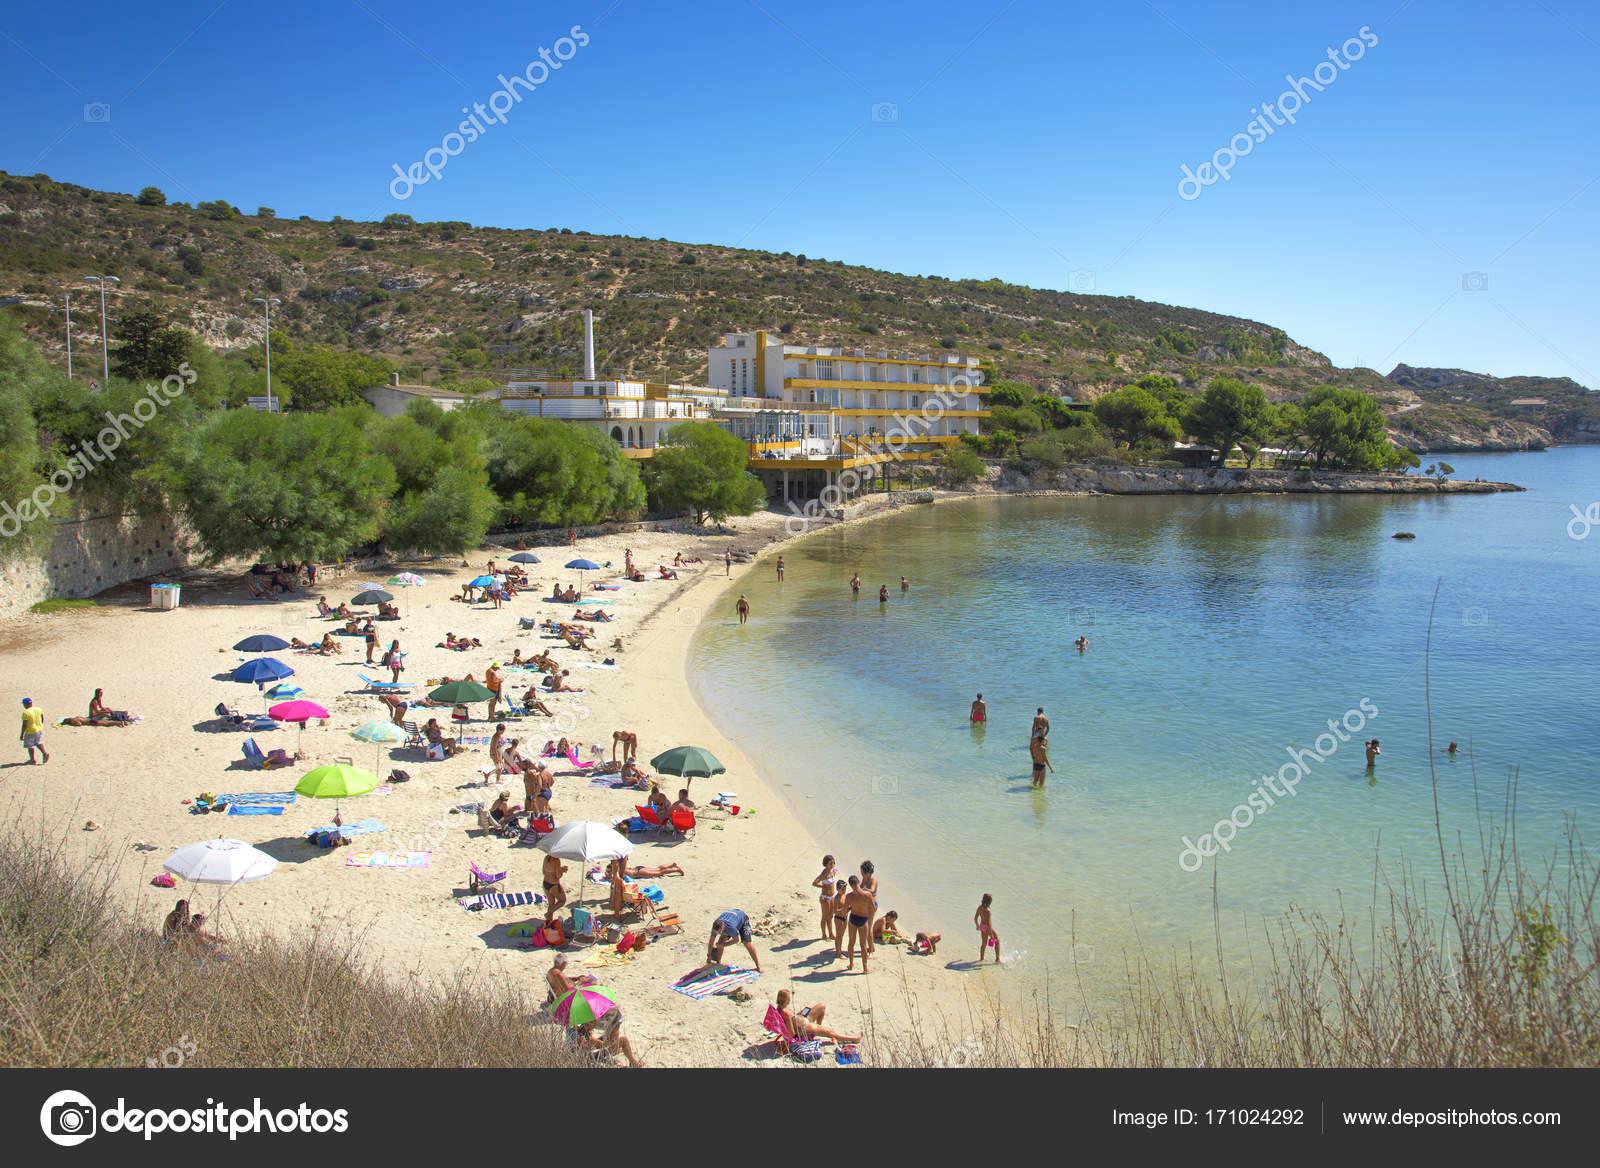 Spiaggia di Calamosca beach in Sardinia, Italy — Redaktionelles ...